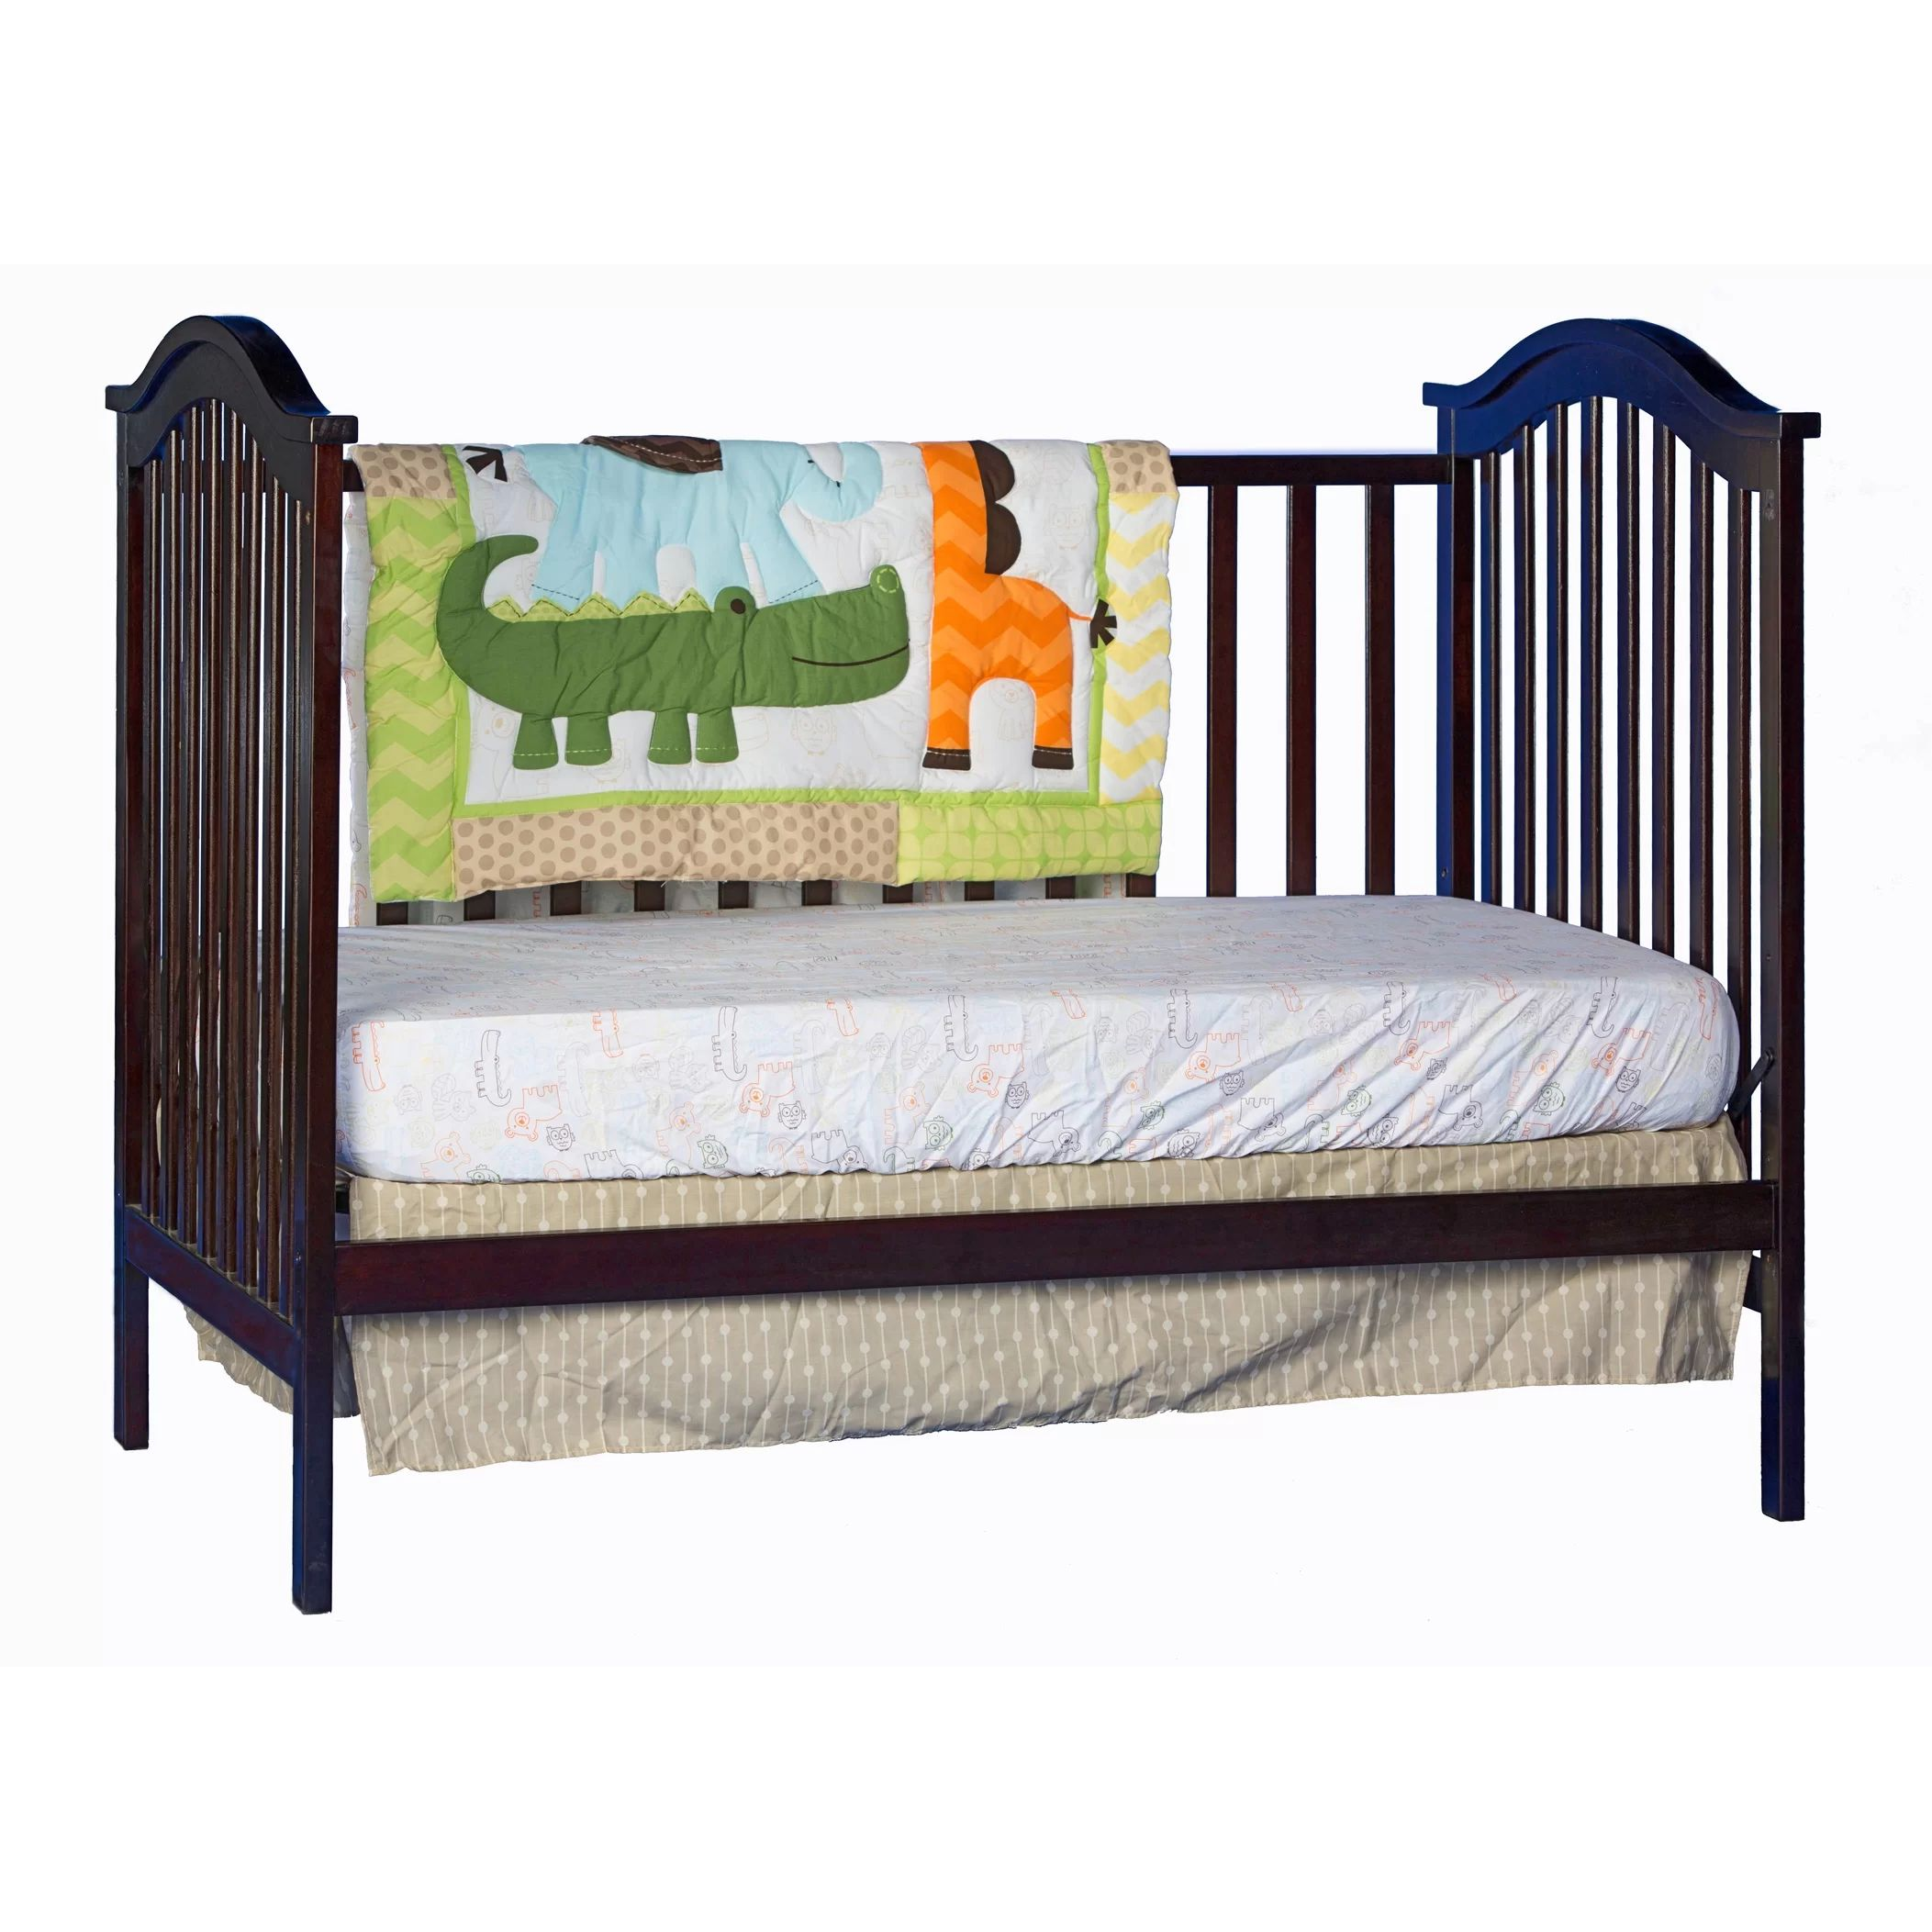 Stork craft crib reviews - Download